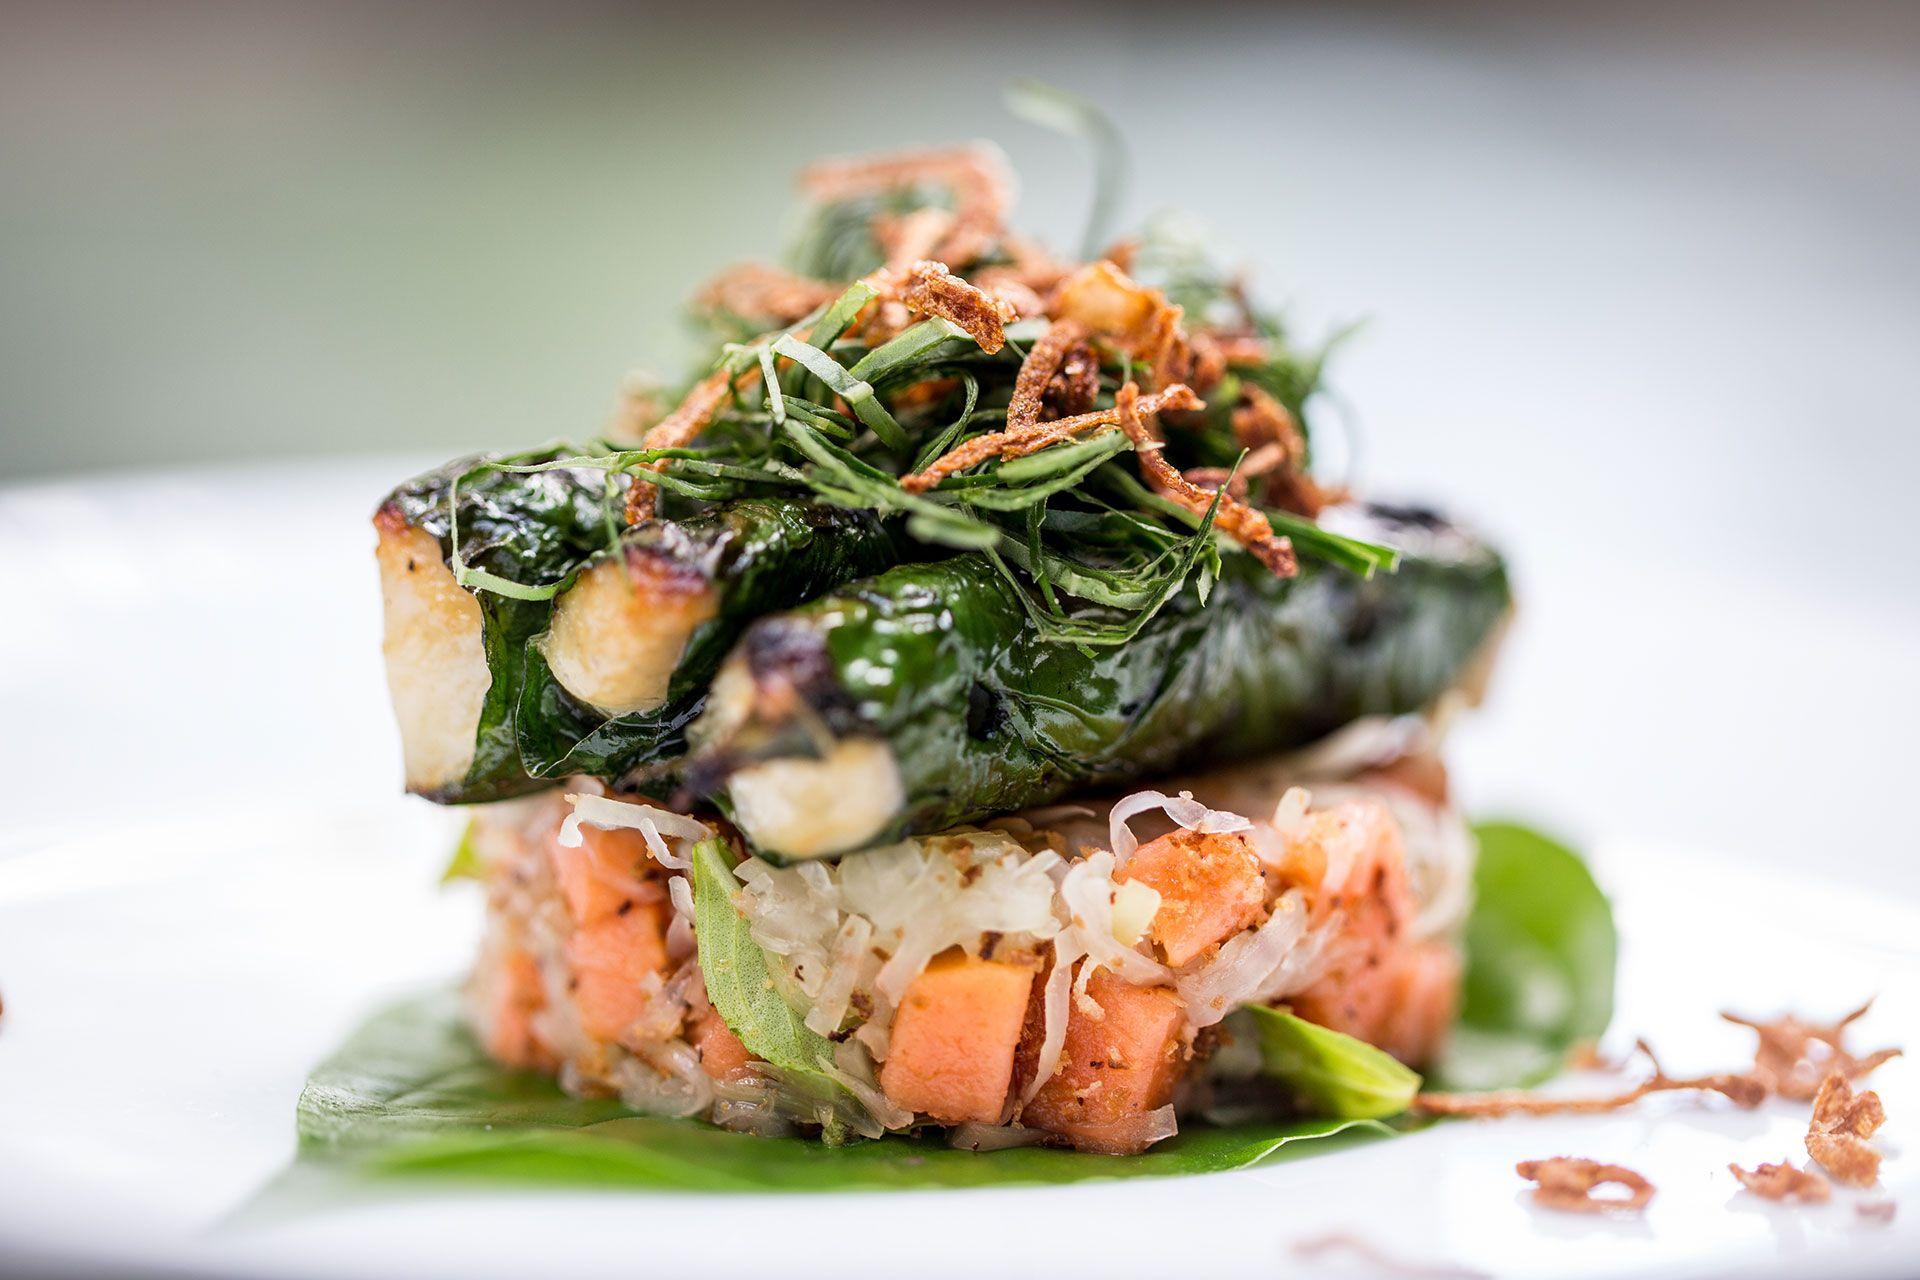 Where To Eat This Week: Oasis Restaurant, The Clifford Pier, Monti, Zafferano, Pou Restaurant & Bar, Lime Restaurant, Azur